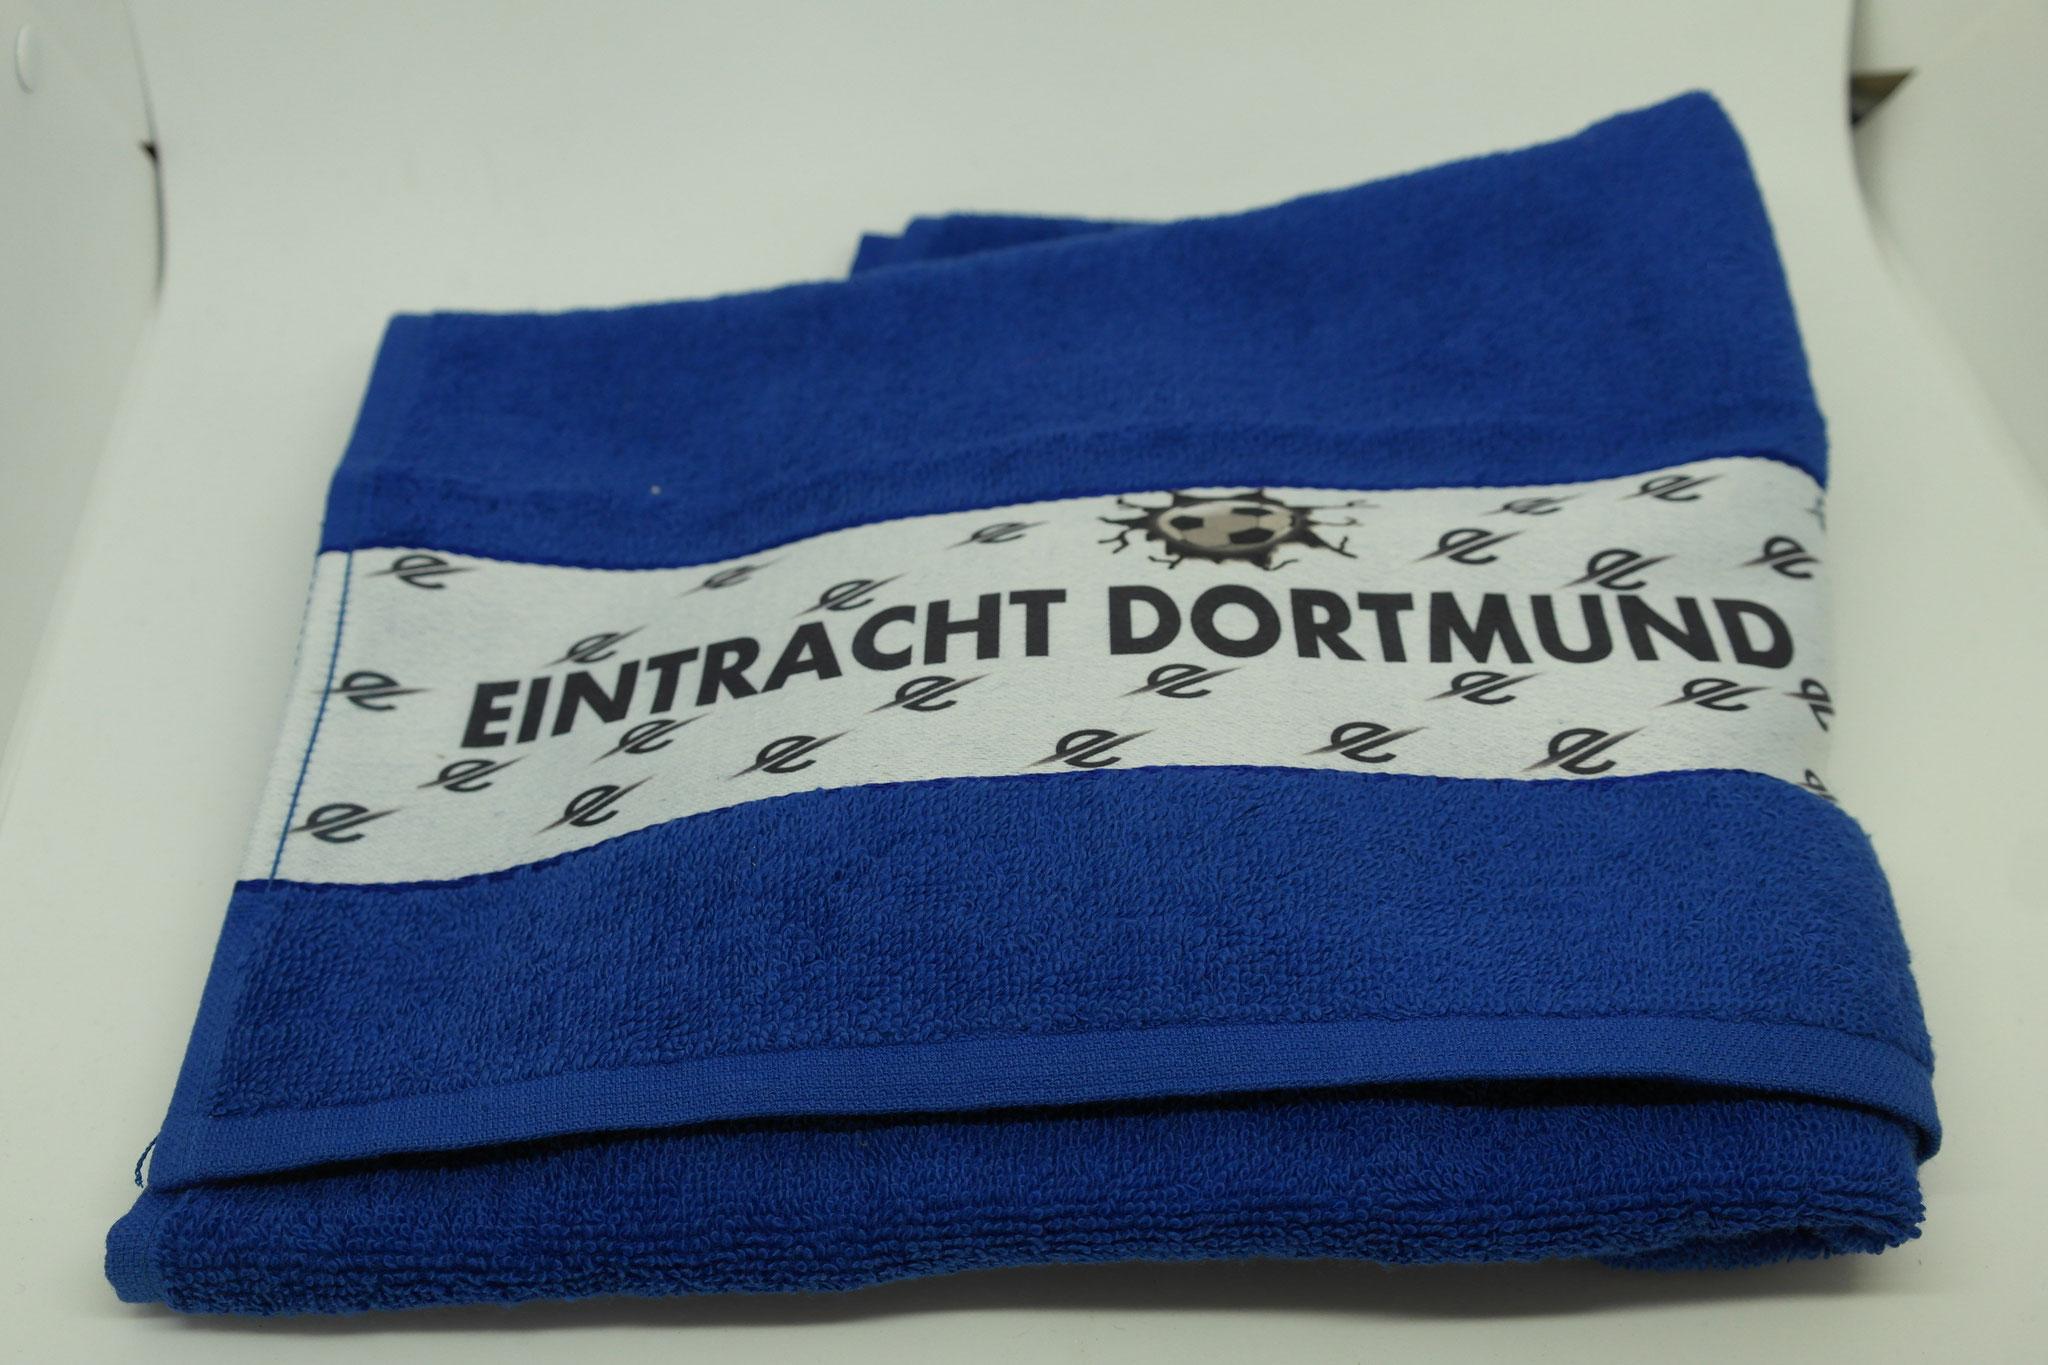 bedruckte Handtücher mit Vereinsname, Logo, Trikotnummer oder Initialen